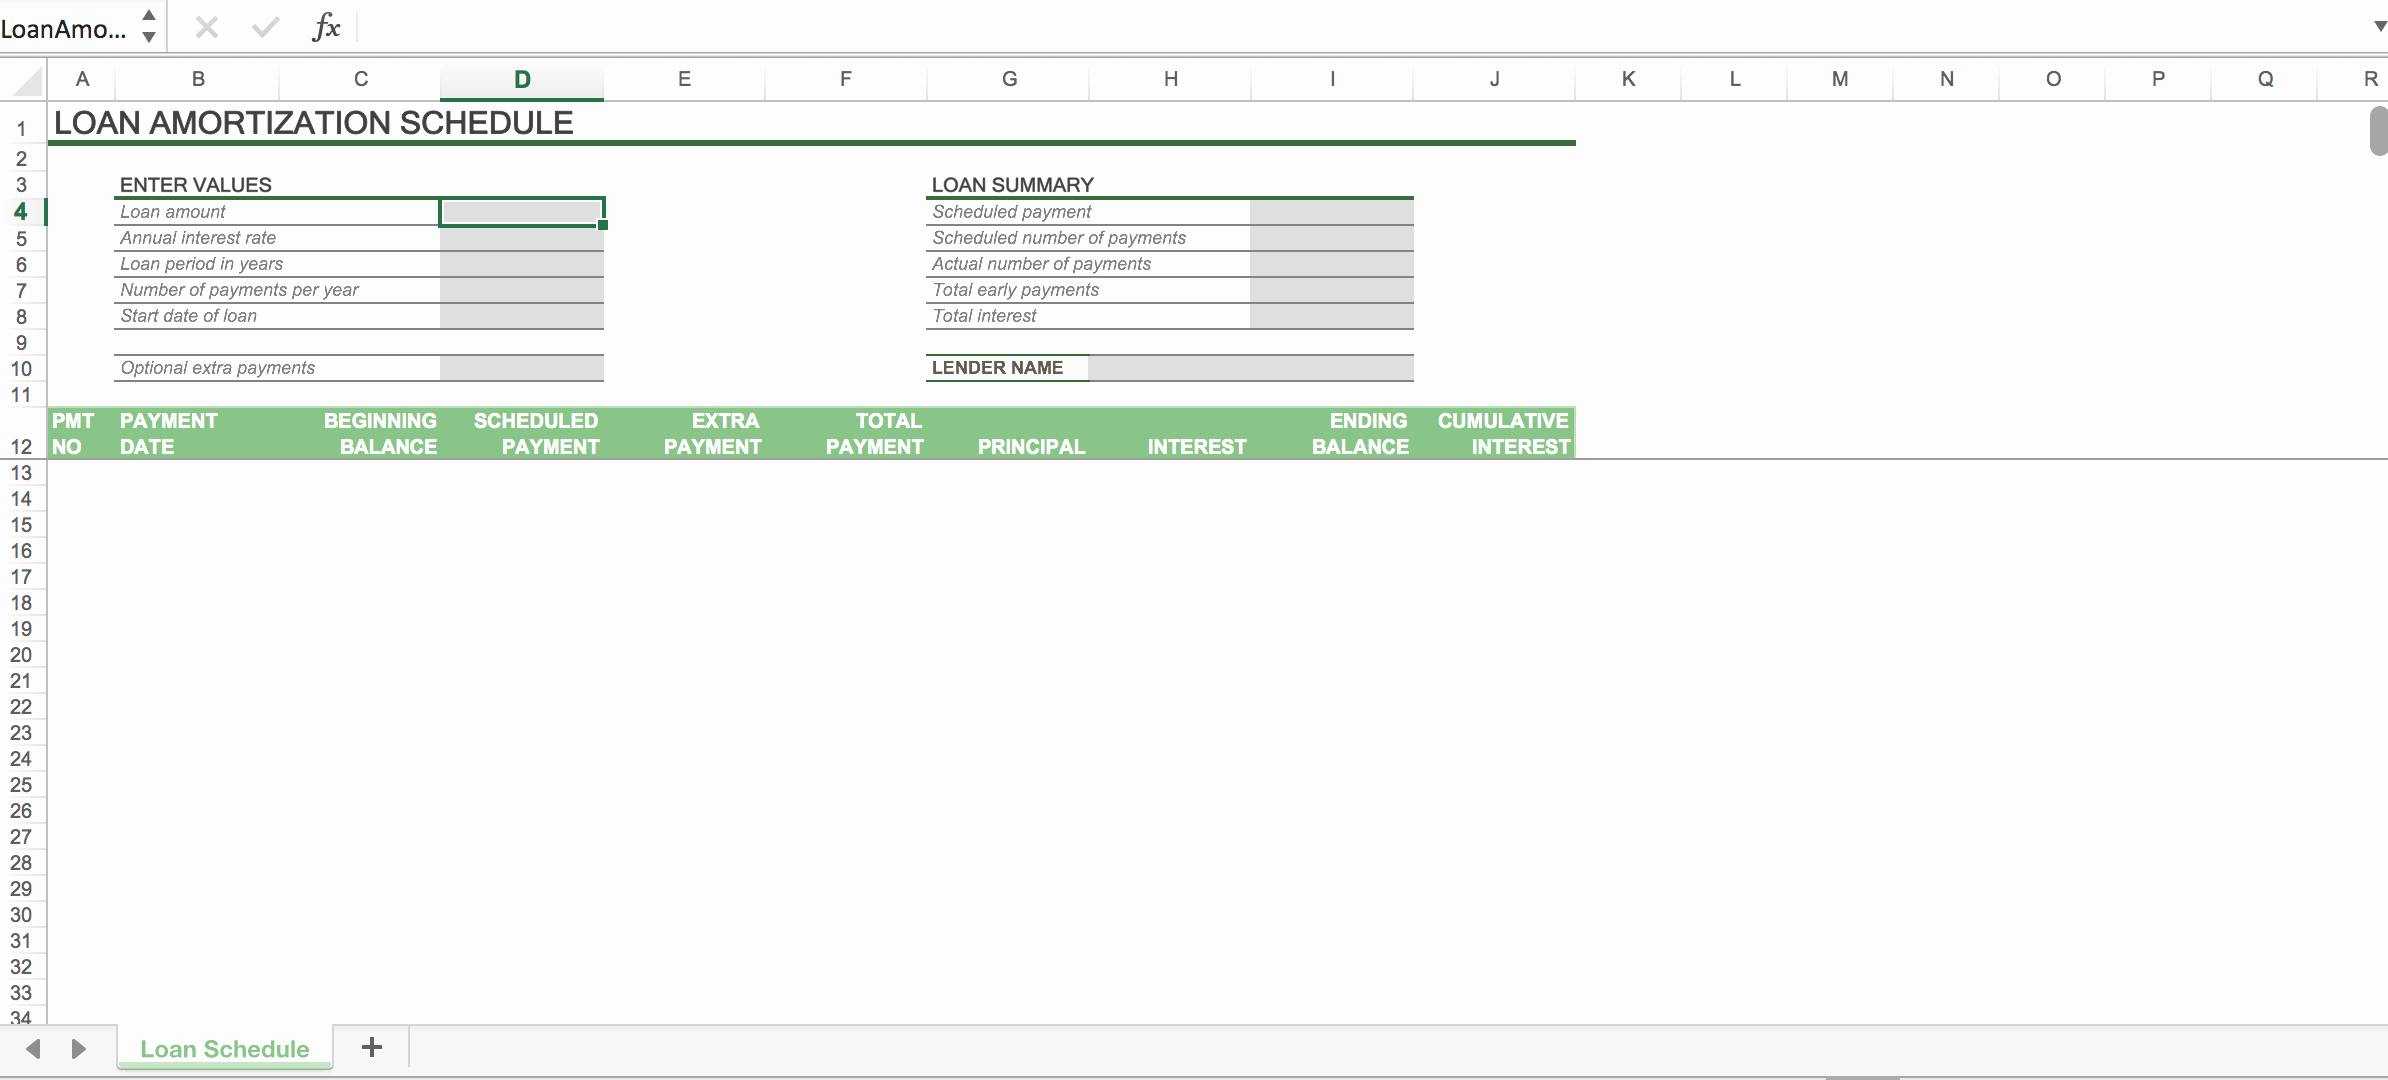 Auto Amortization Schedule Excel Elegant Car Loan Amortization Schedule Excel with Extra Payments